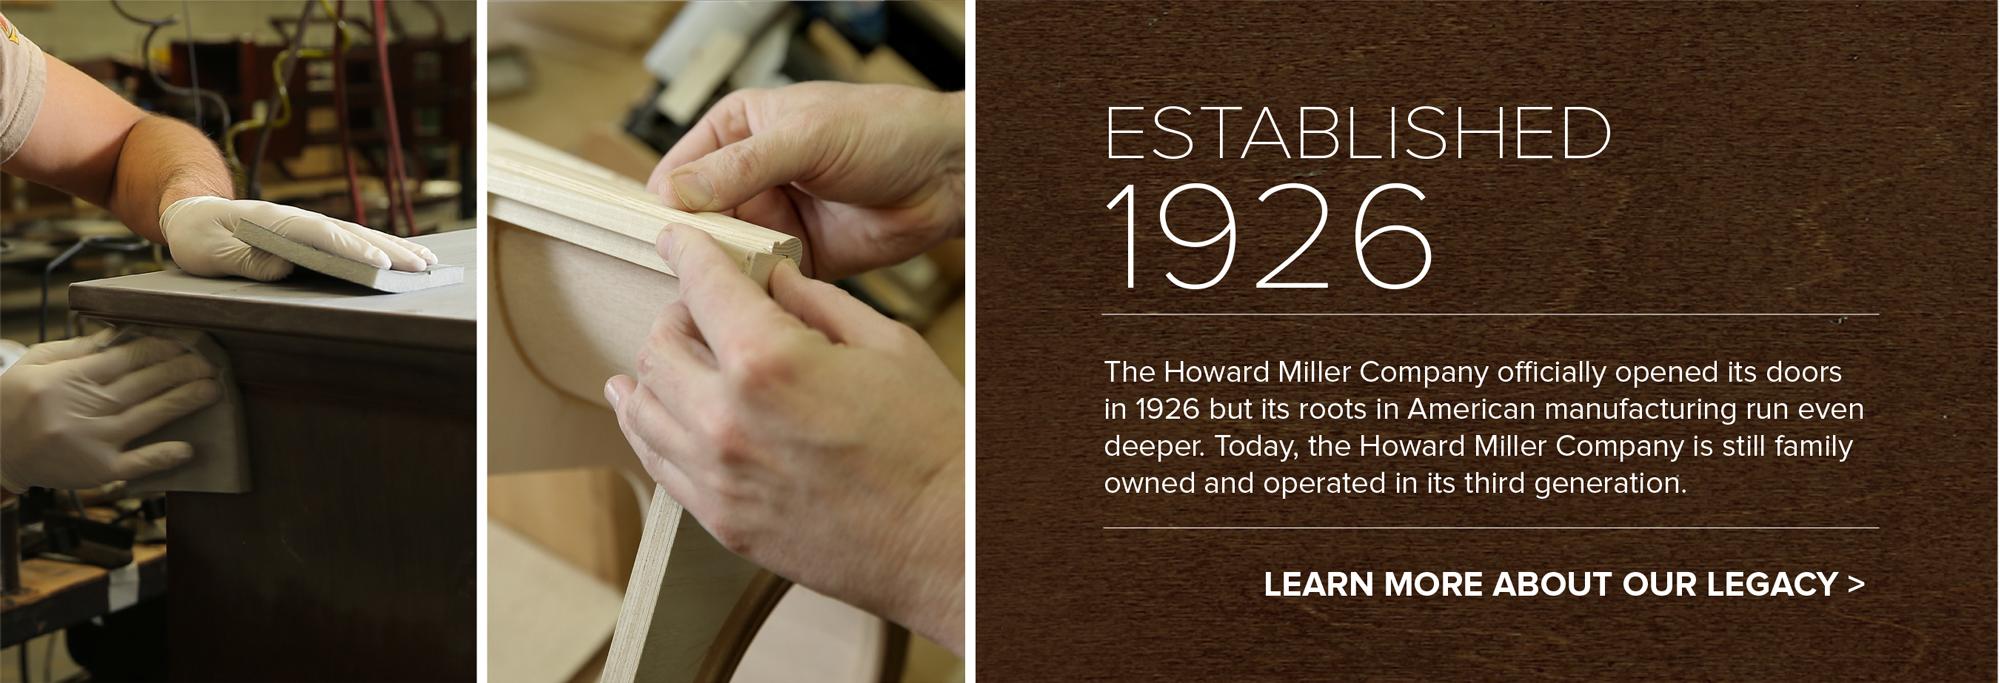 Howard Miller Legacy